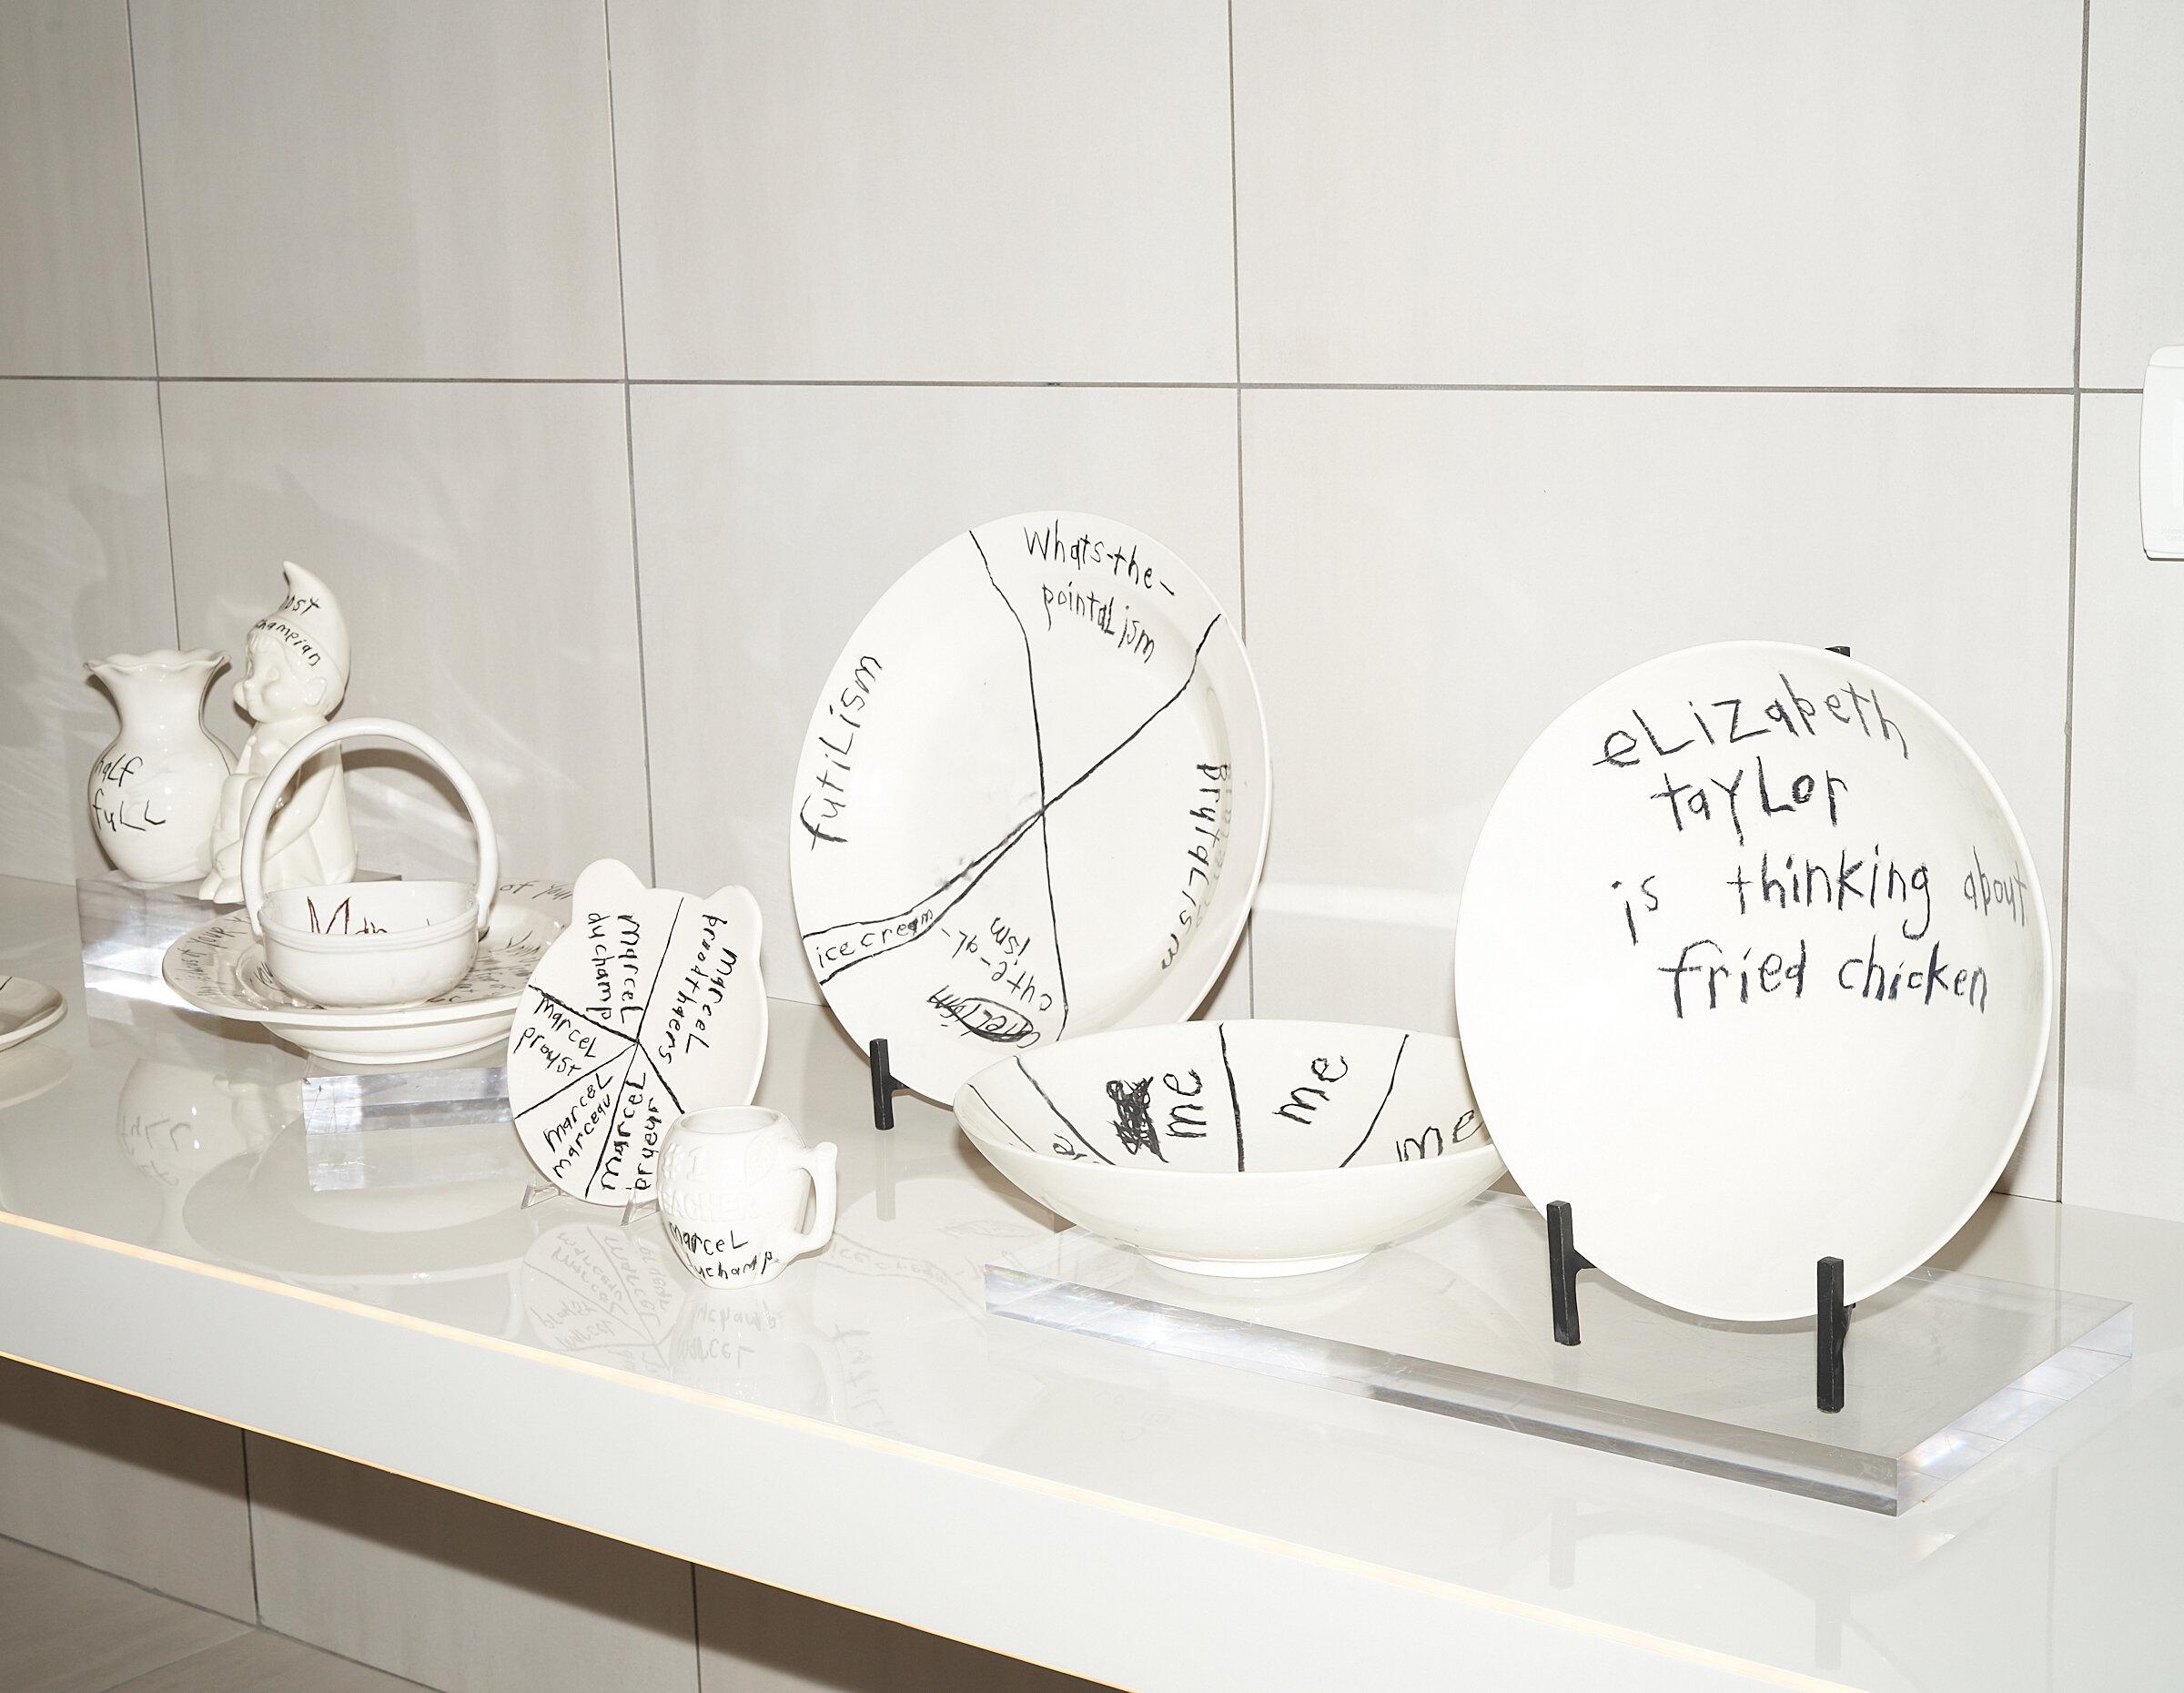 Some ceramics from the exhibit.